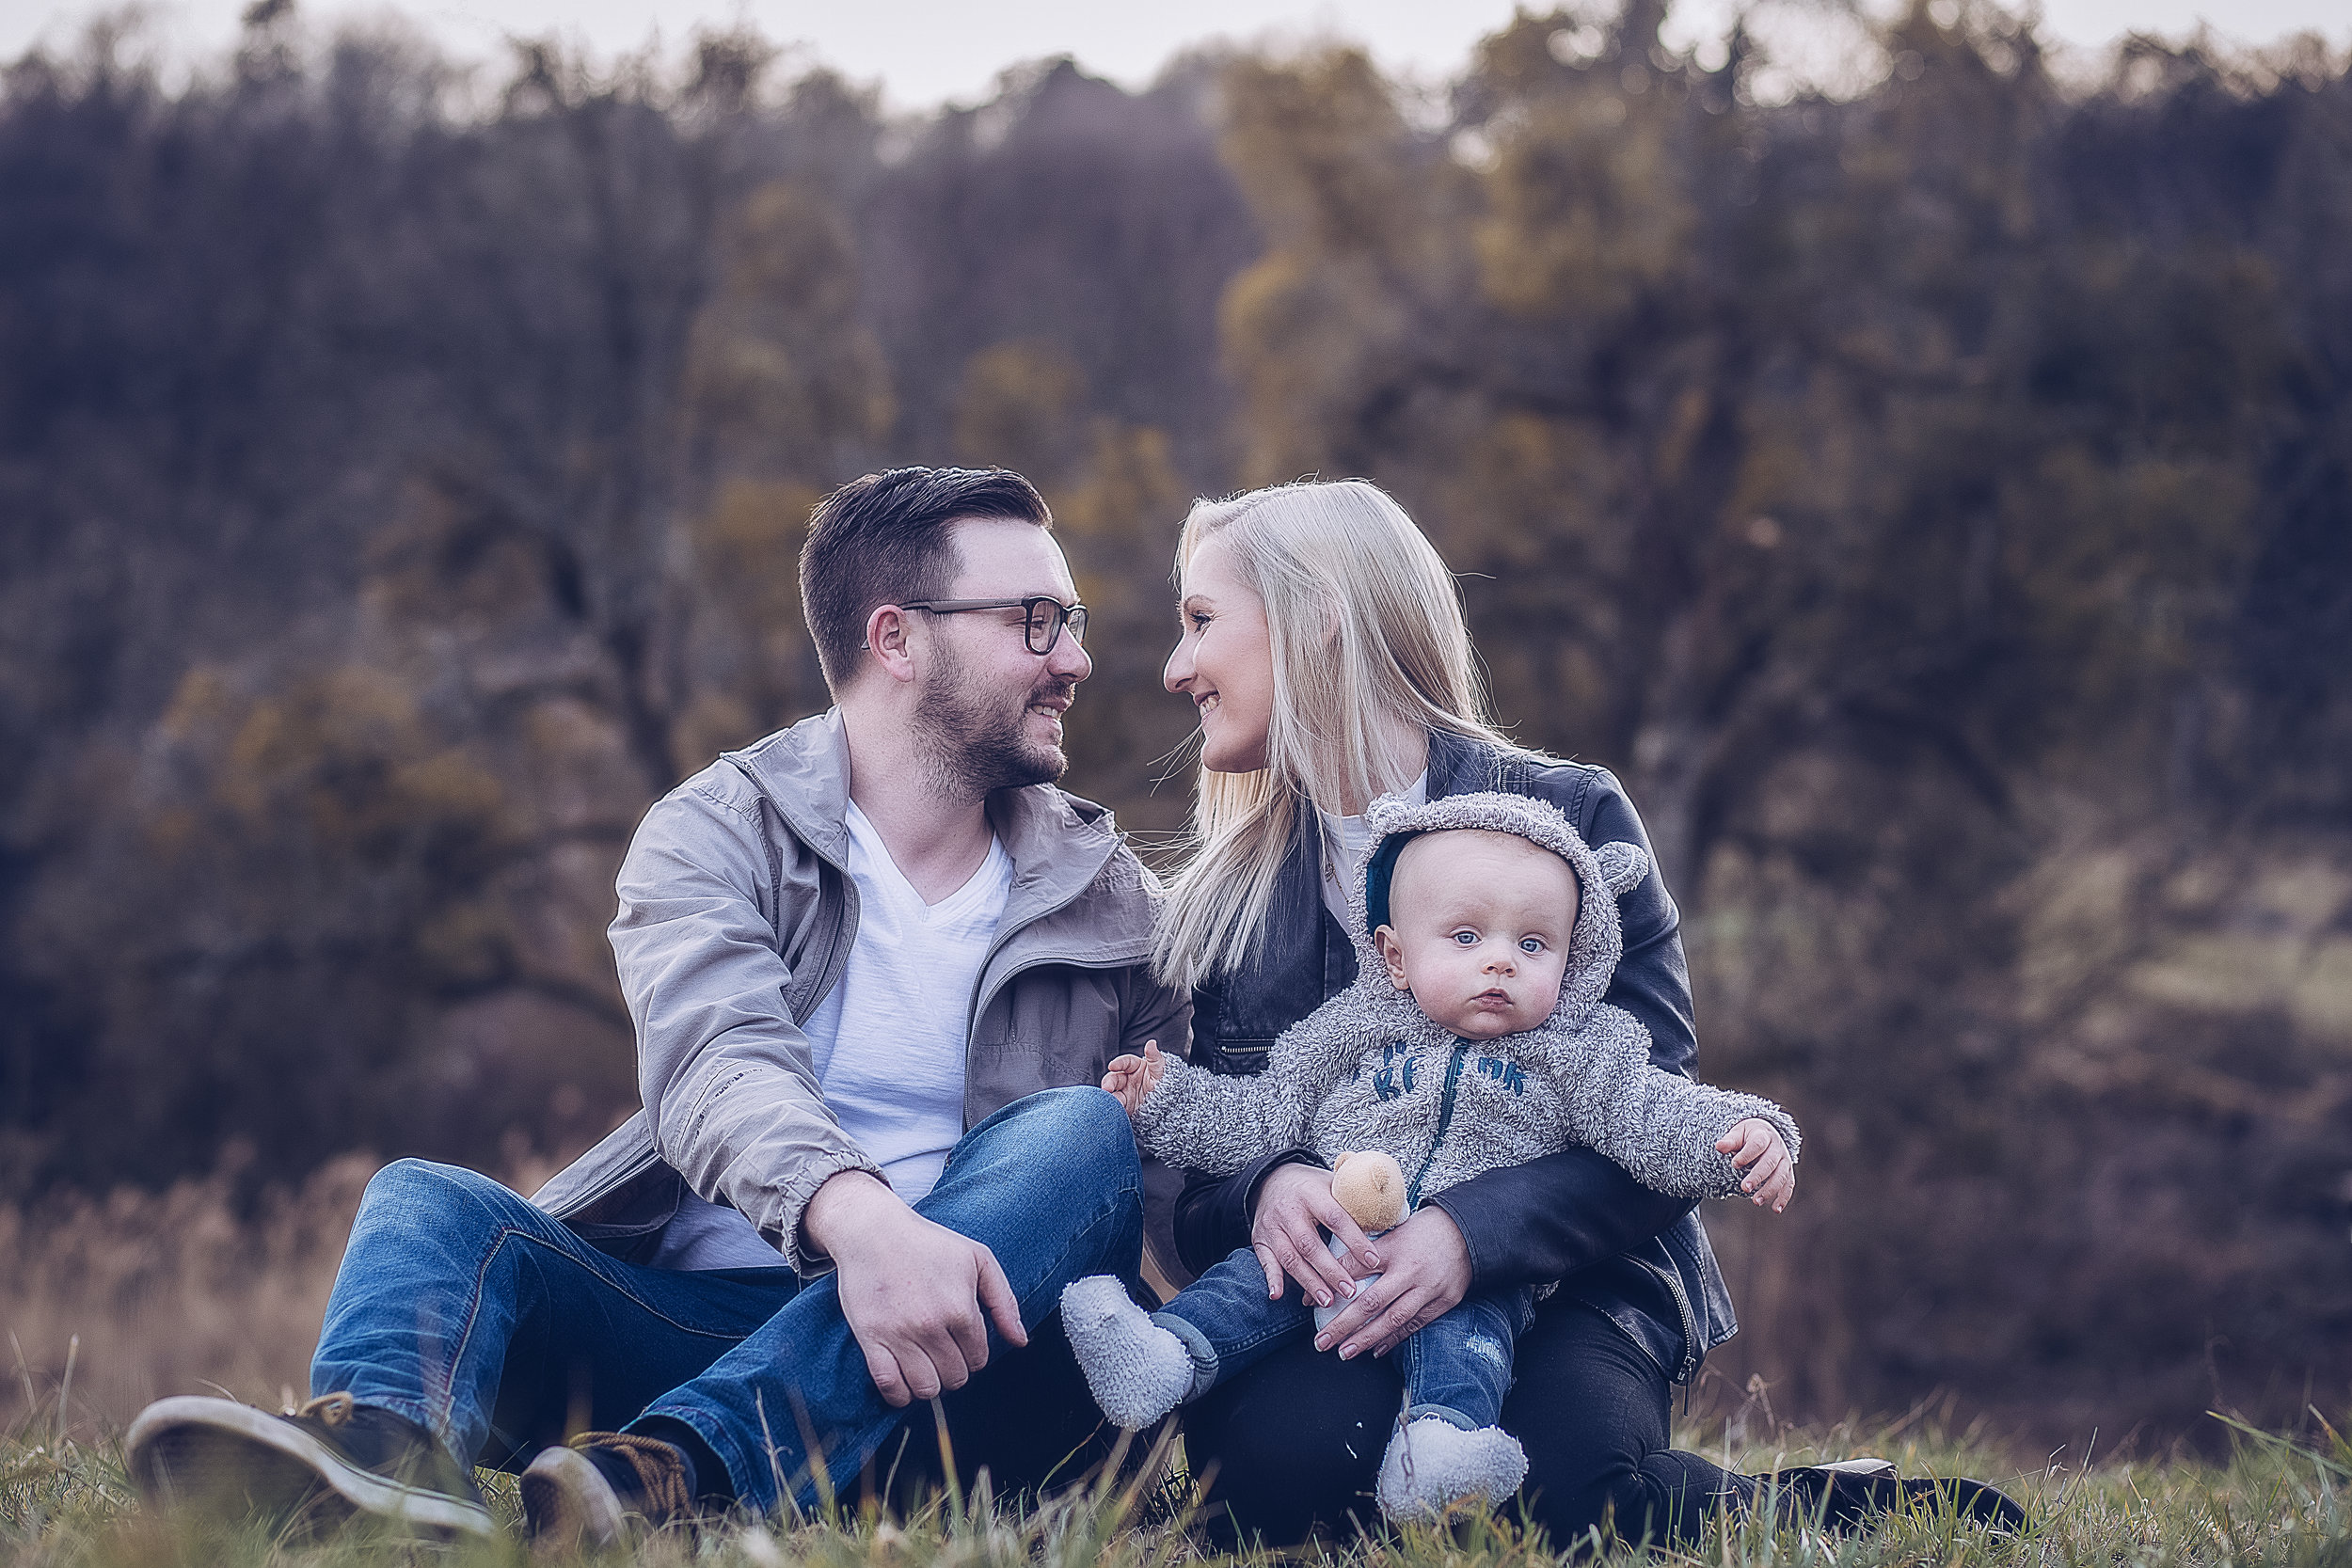 JenniferSpurkFotografie-Familyshooting - Paar mit Baby2